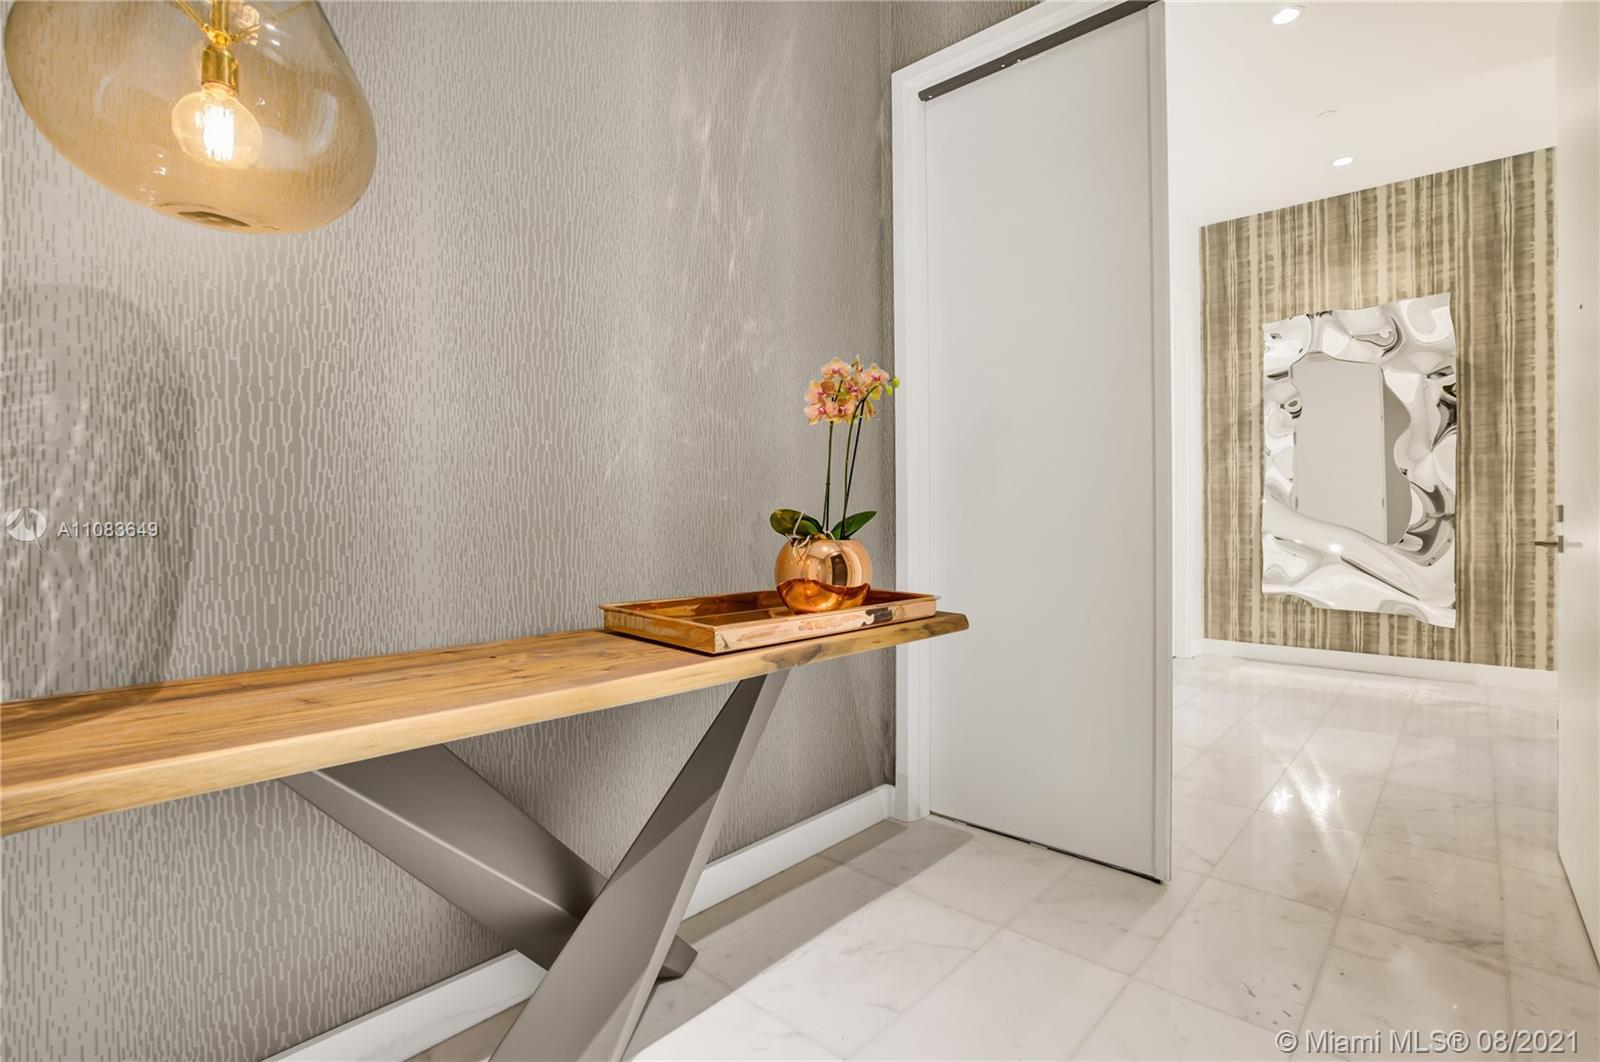 2821 S Bayshore Dr, Unit #16A Luxury Real Estate